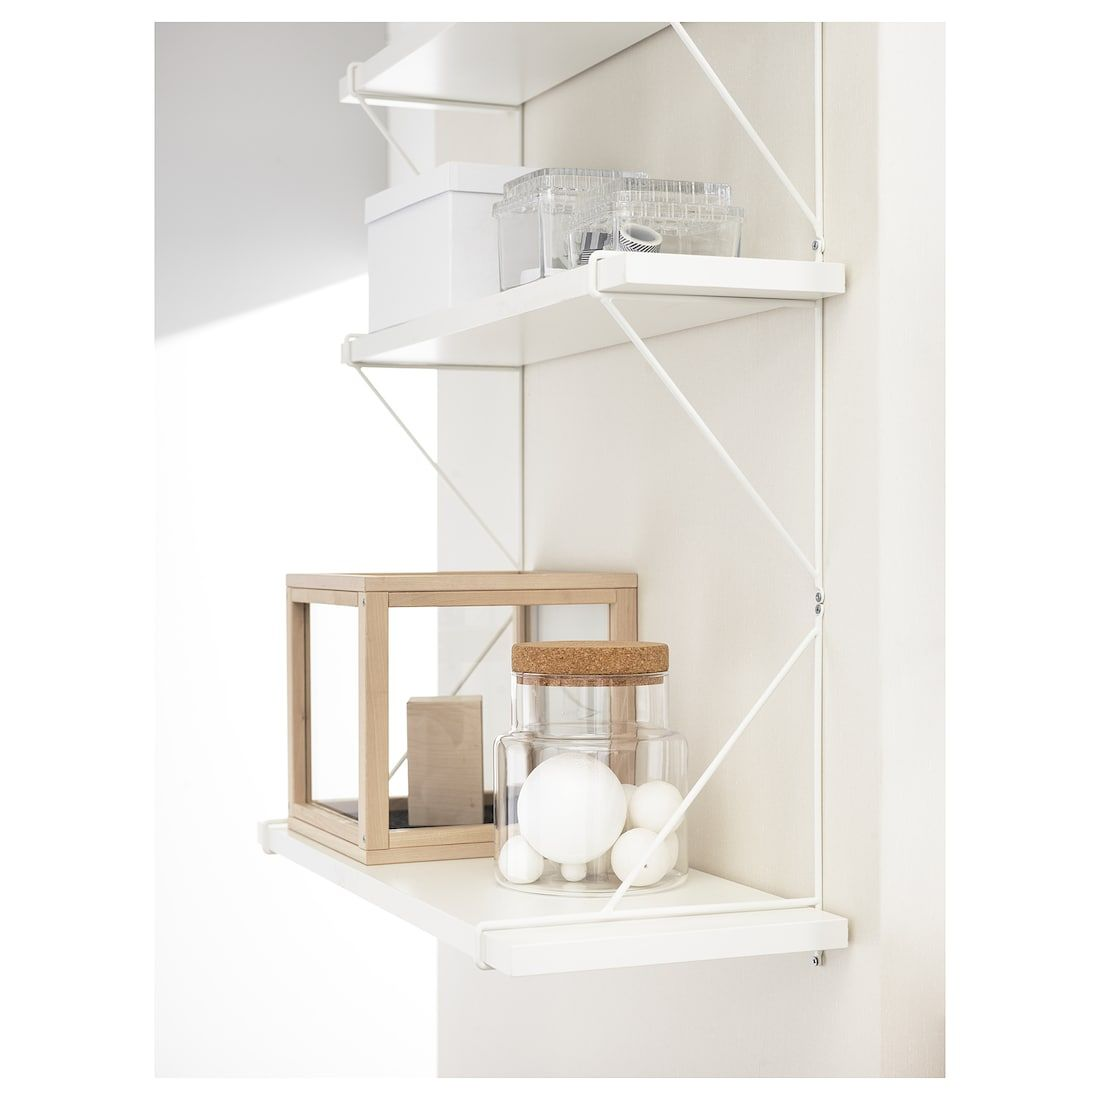 Bergshult Pershult Wall Shelf White White 31 1 2x7 7 8 In